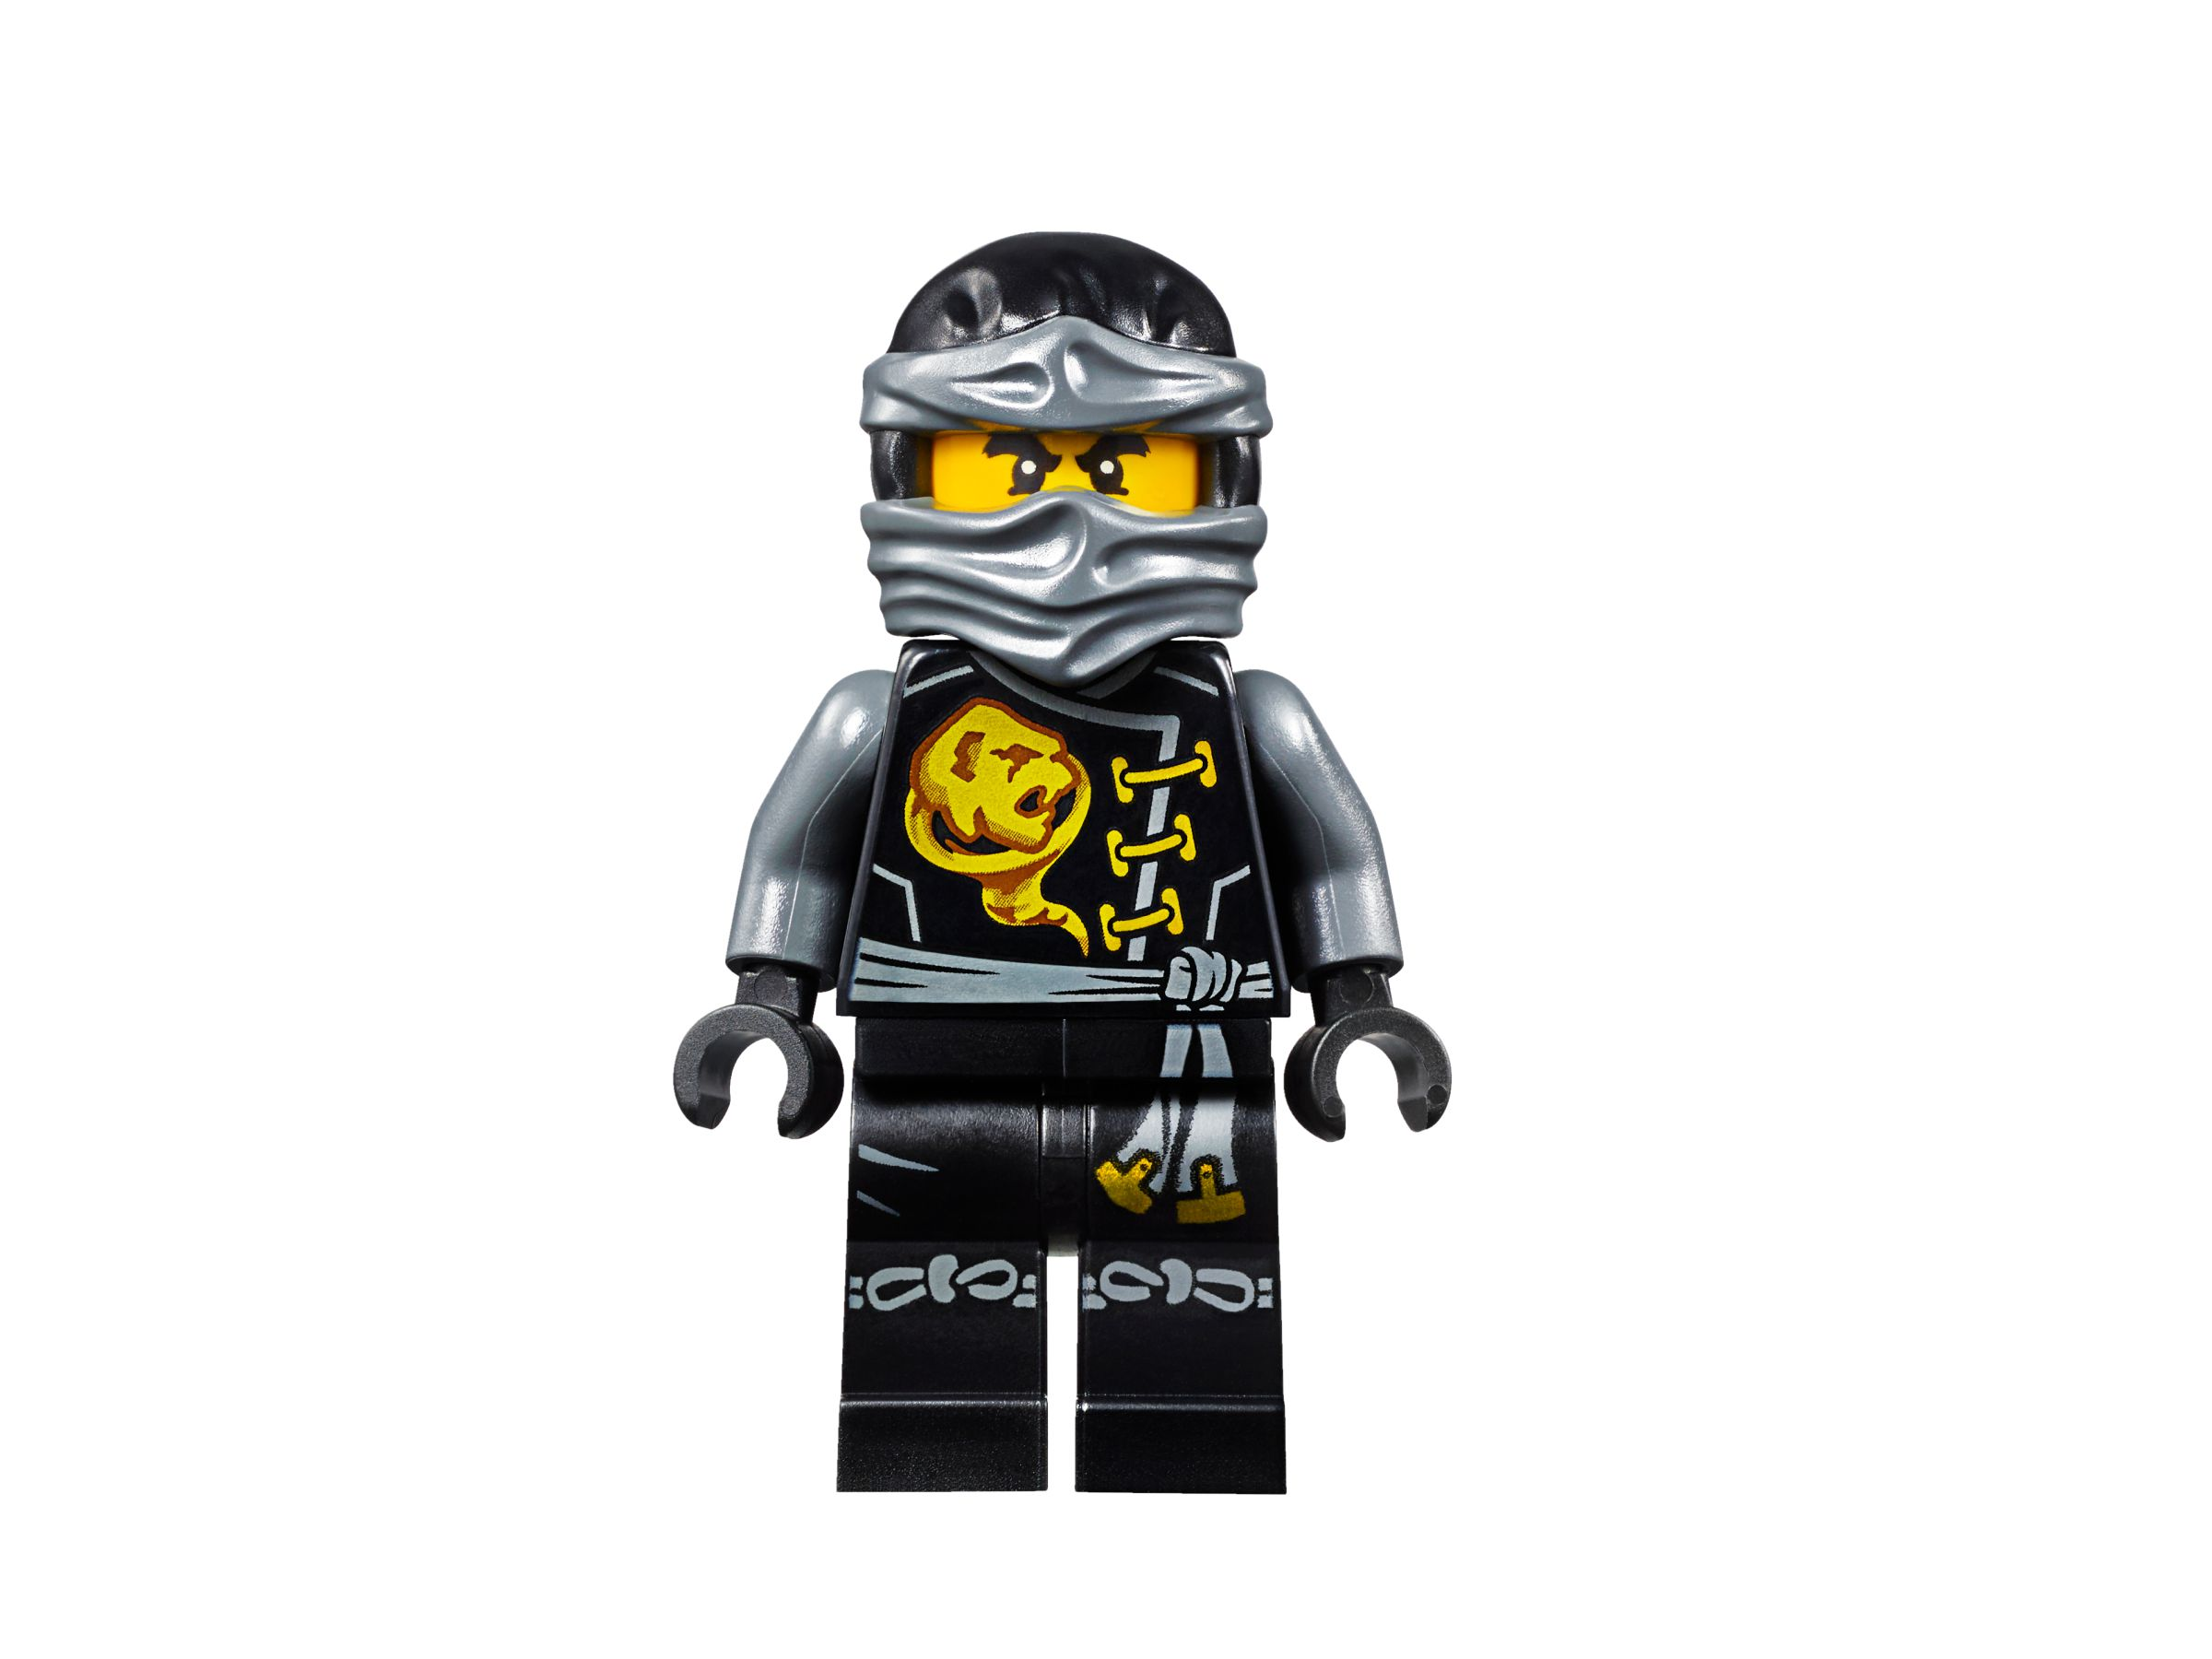 Lego 70599 coles drache ninjago 2016 cole 39 s dragon brickmerge - Lego ninjago 6 ...